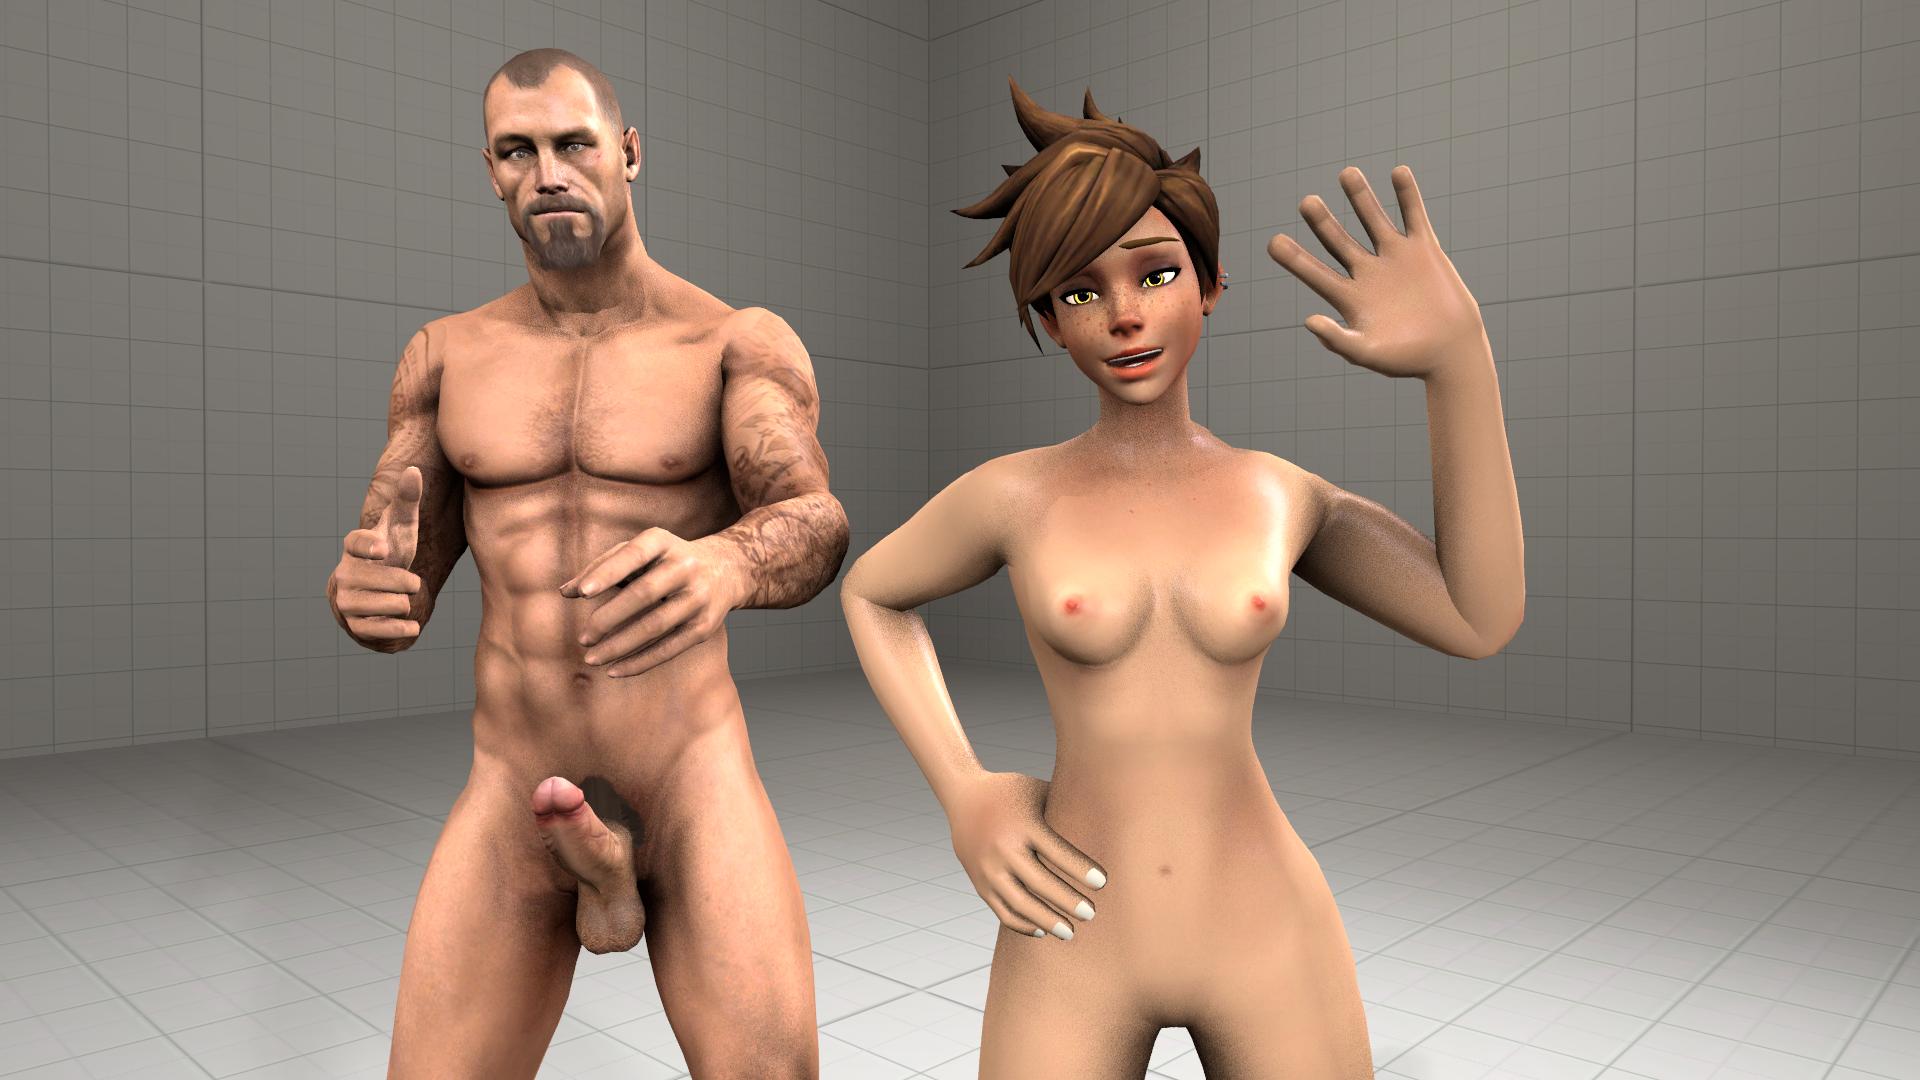 Sfm nude models